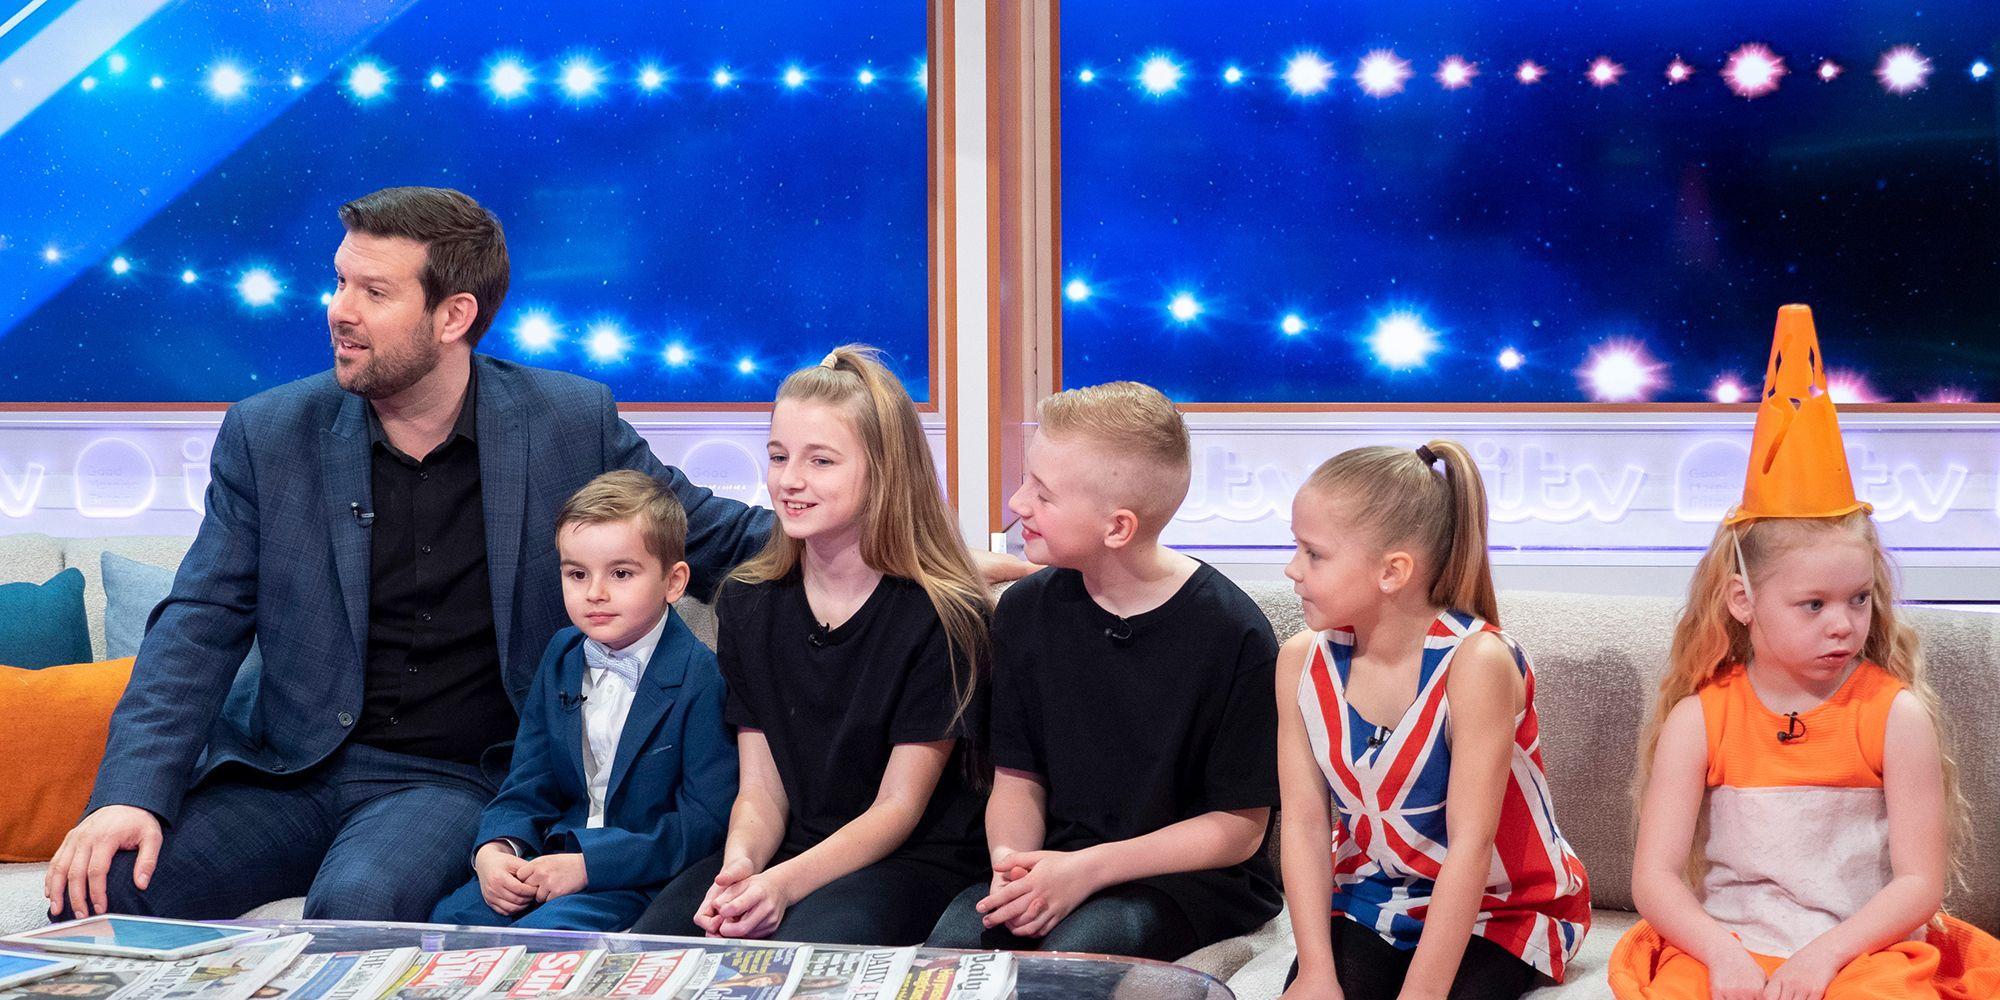 'Good Morning Britain' TV show, London, UK - 08 Apr 2019